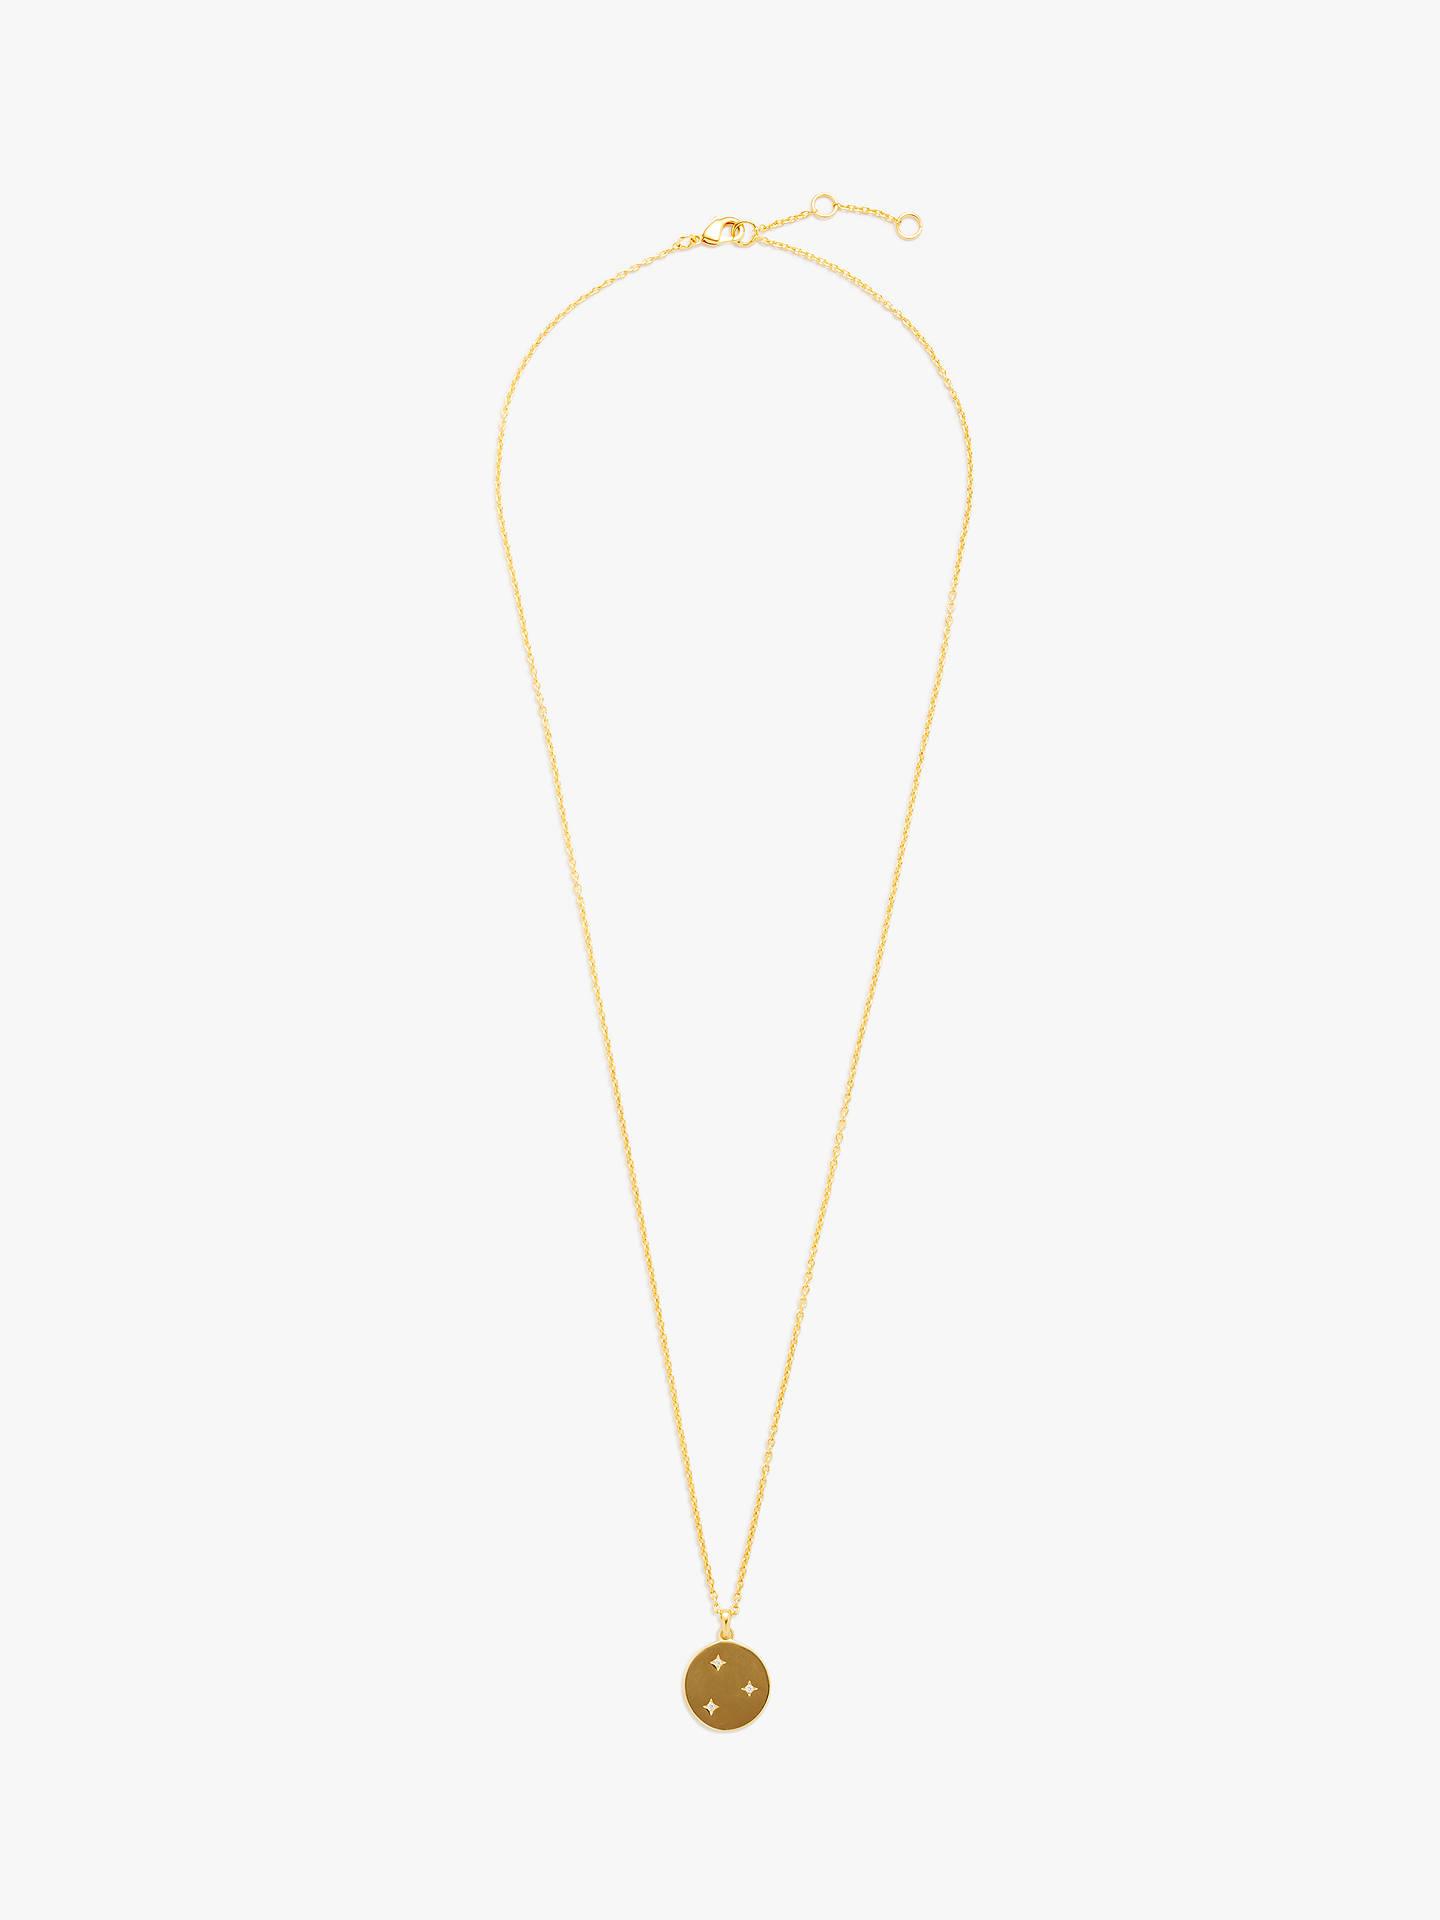 fcf751e54e79a John Lewis & Partners Star Disc Pendant Necklace, Gold